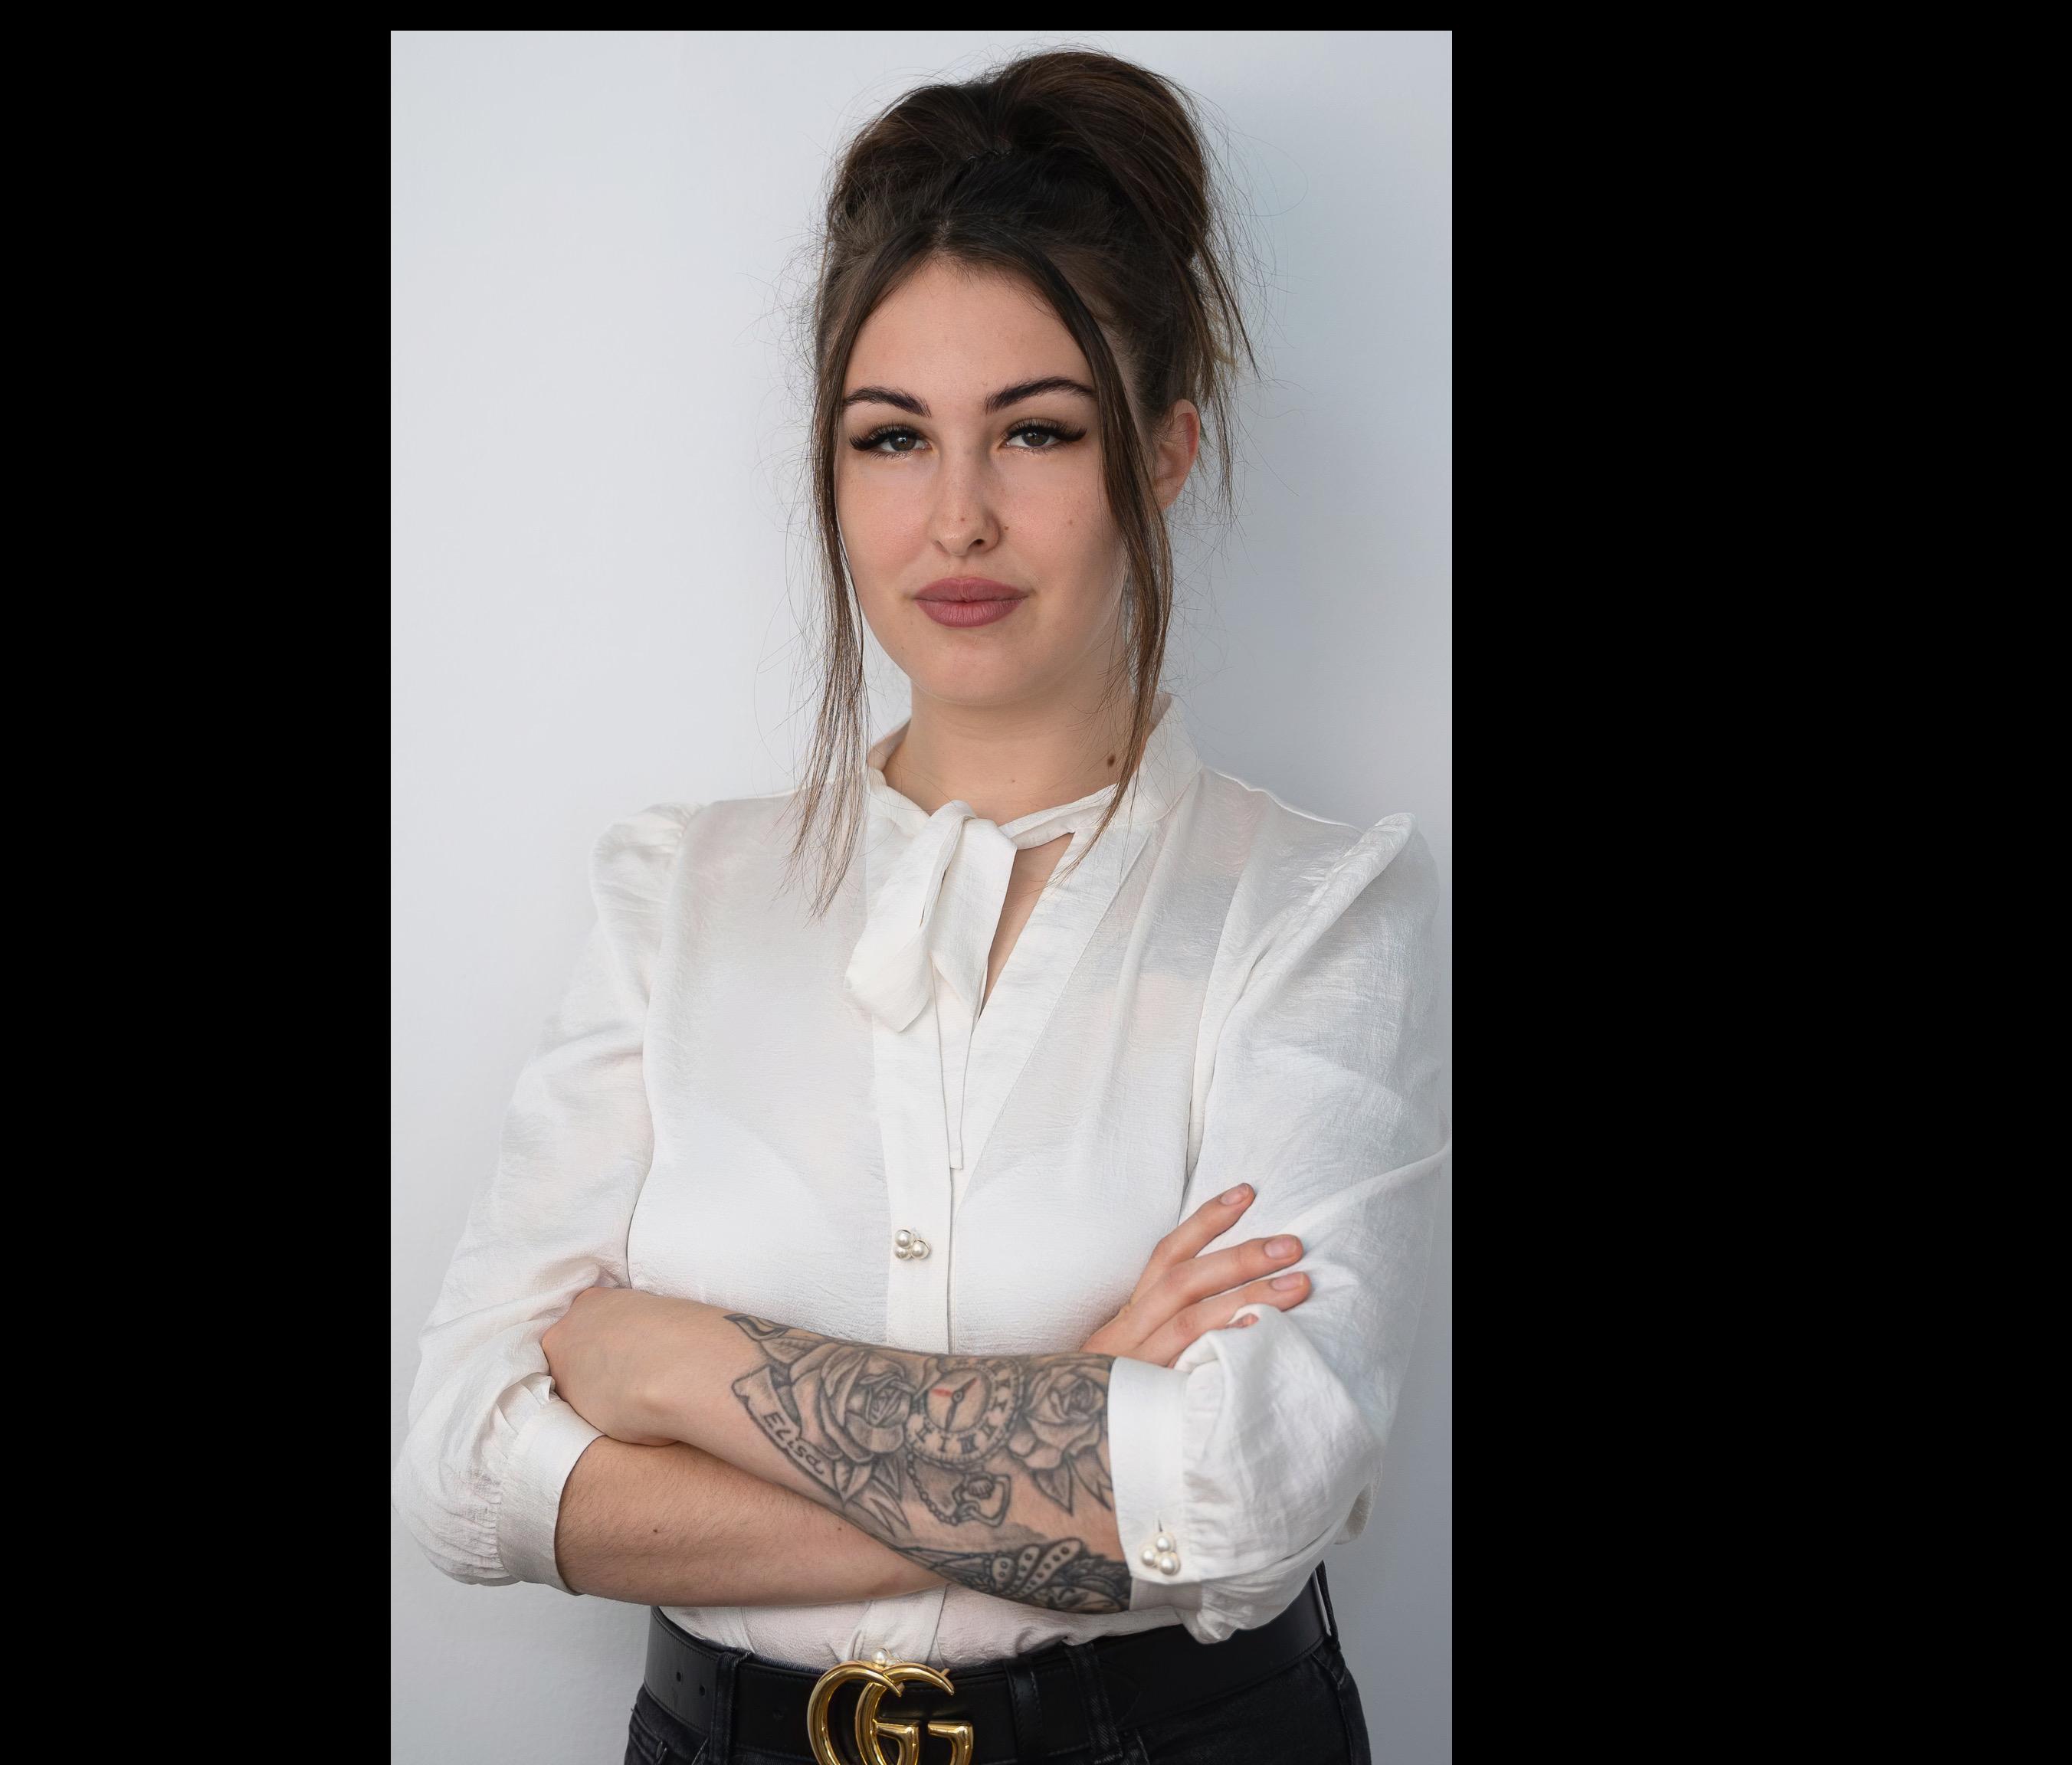 BRAND AMBASSADOR Minel Özkan